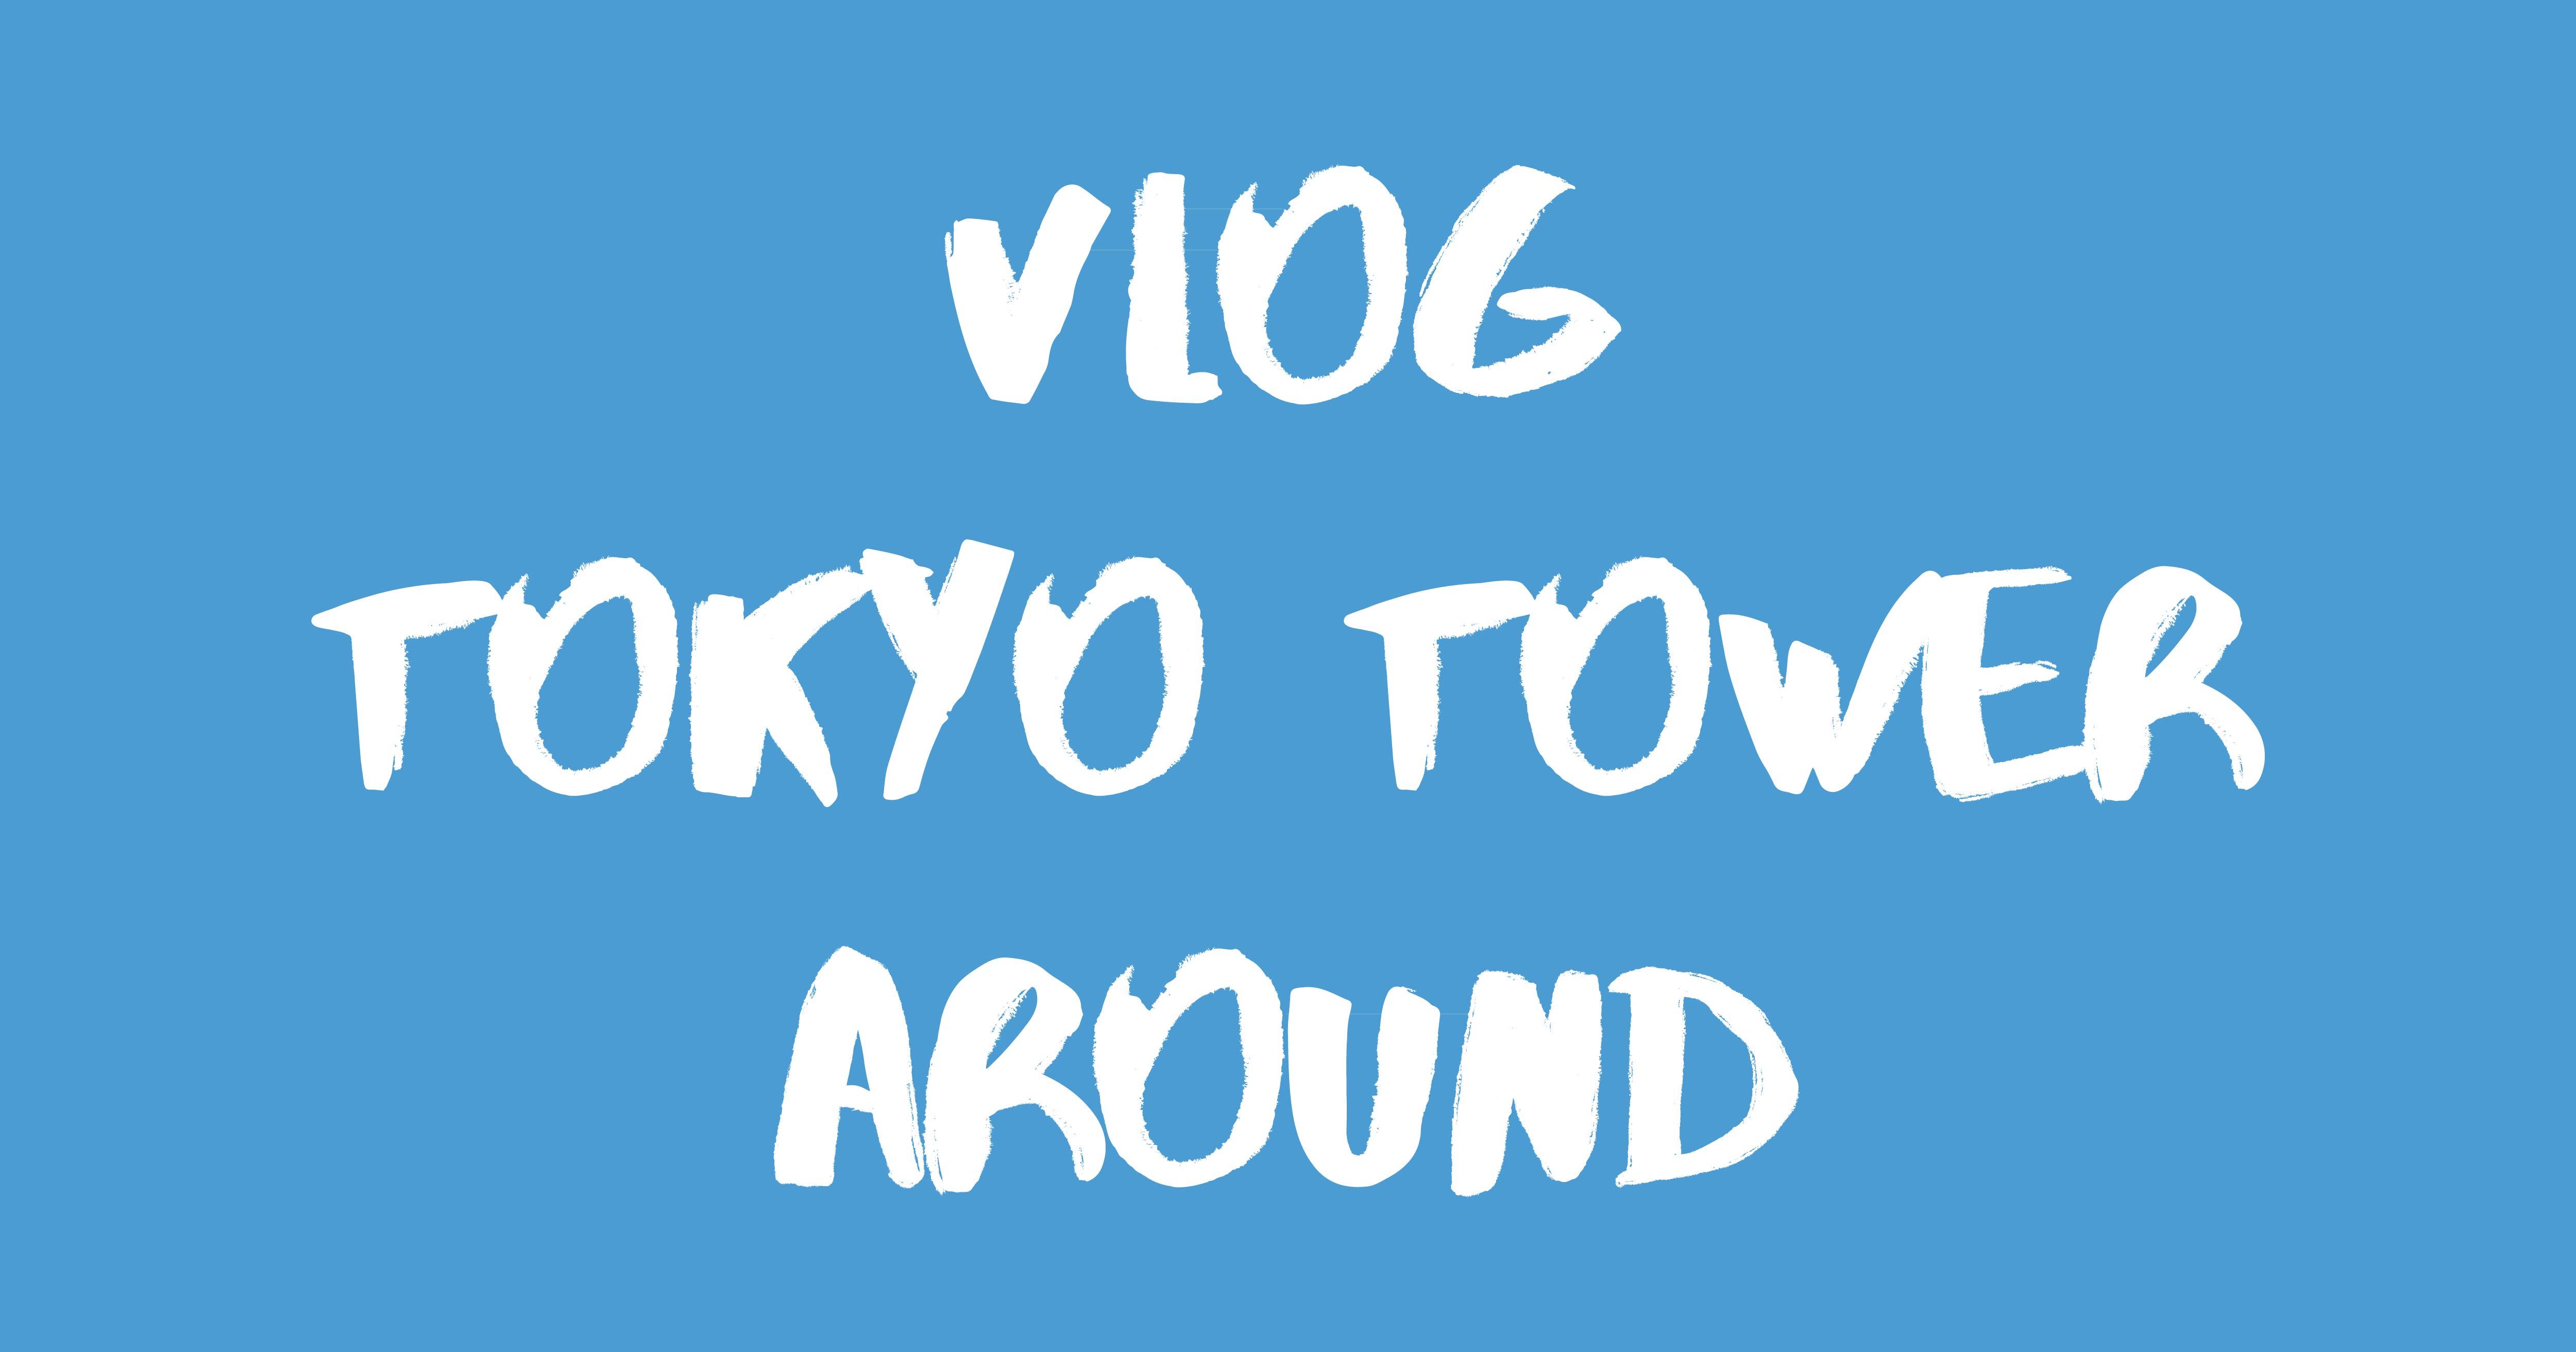 [Vlog] 東京タワー&周辺エリア / Tokyo Tower & Around